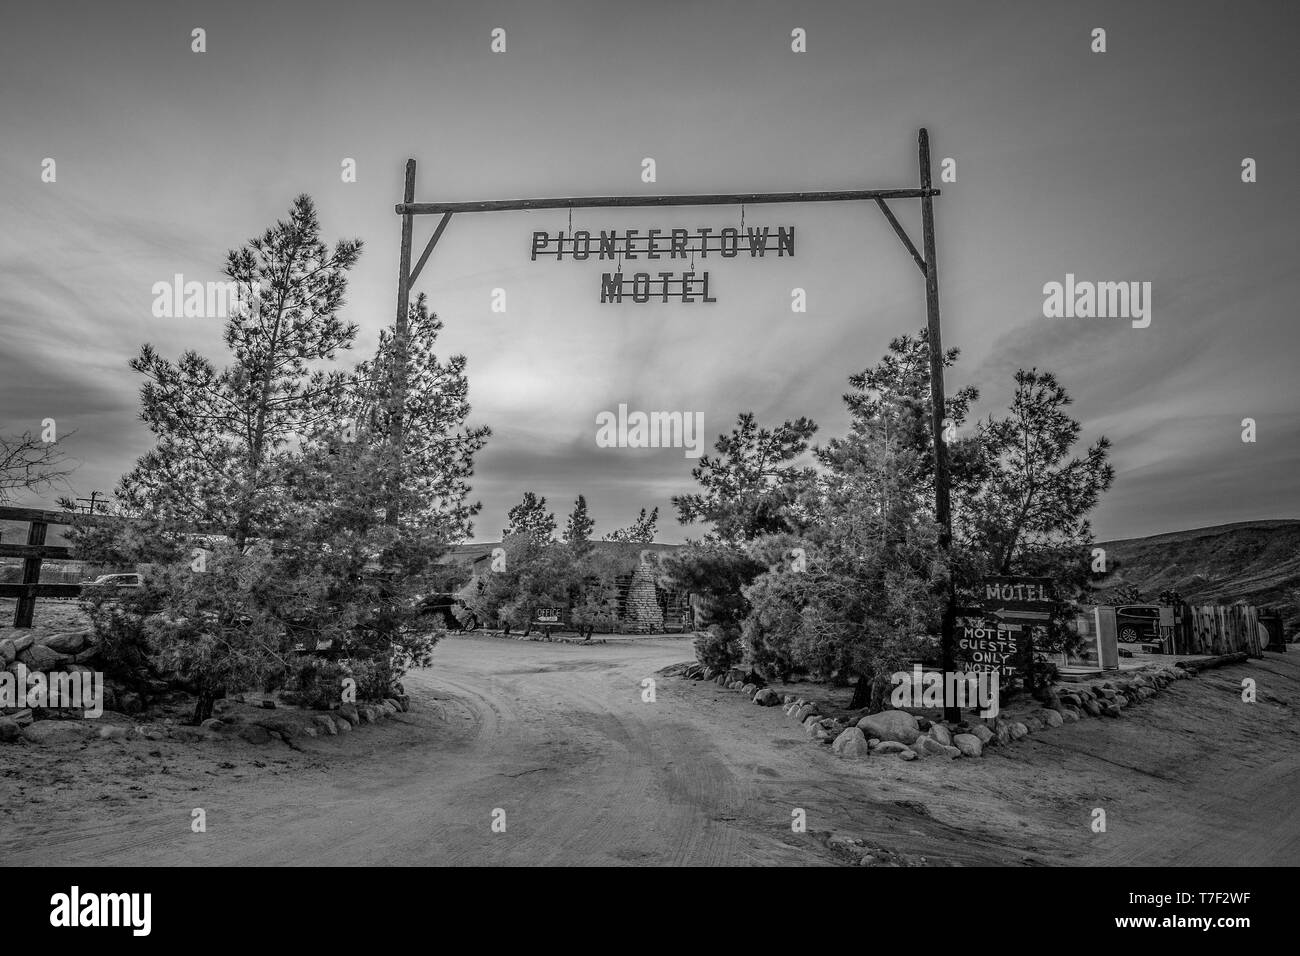 Pioneertown Motel in California in the evening - CALIFORNIA, USA - MARCH 18, 2019 Stock Photo